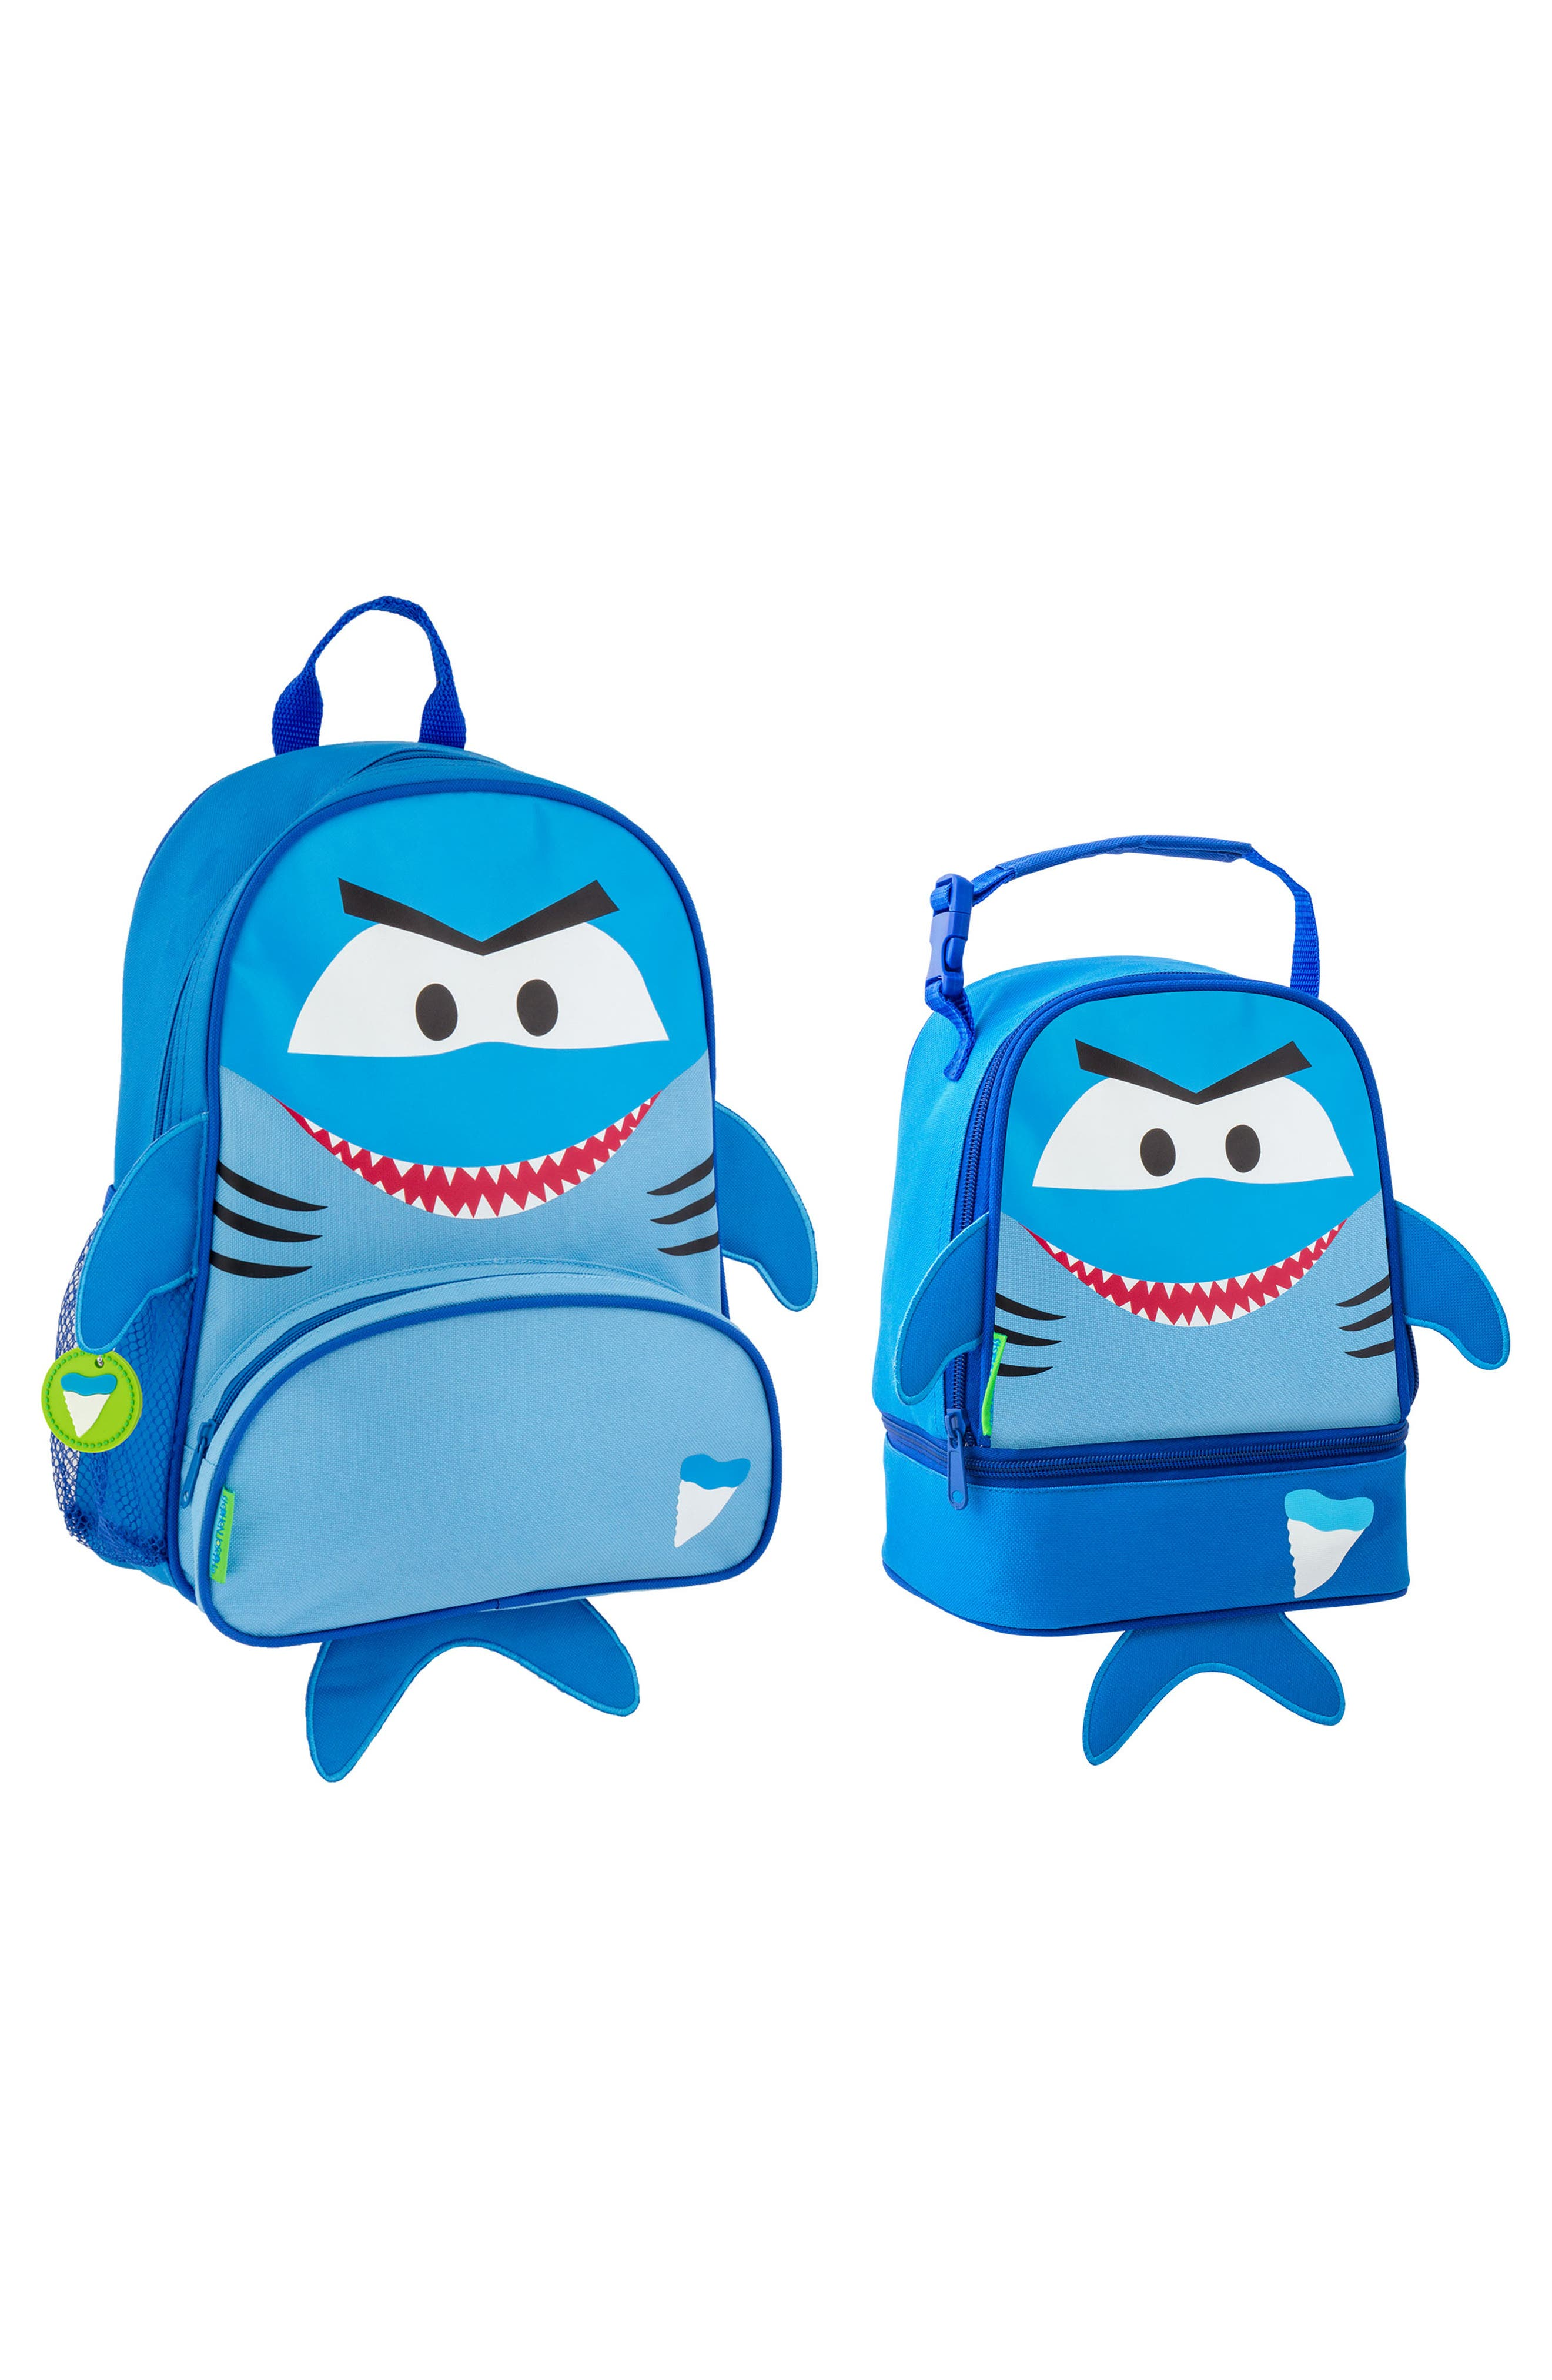 Shark Sidekick Backpack & Lunch Pal,                             Main thumbnail 1, color,                             SHARK